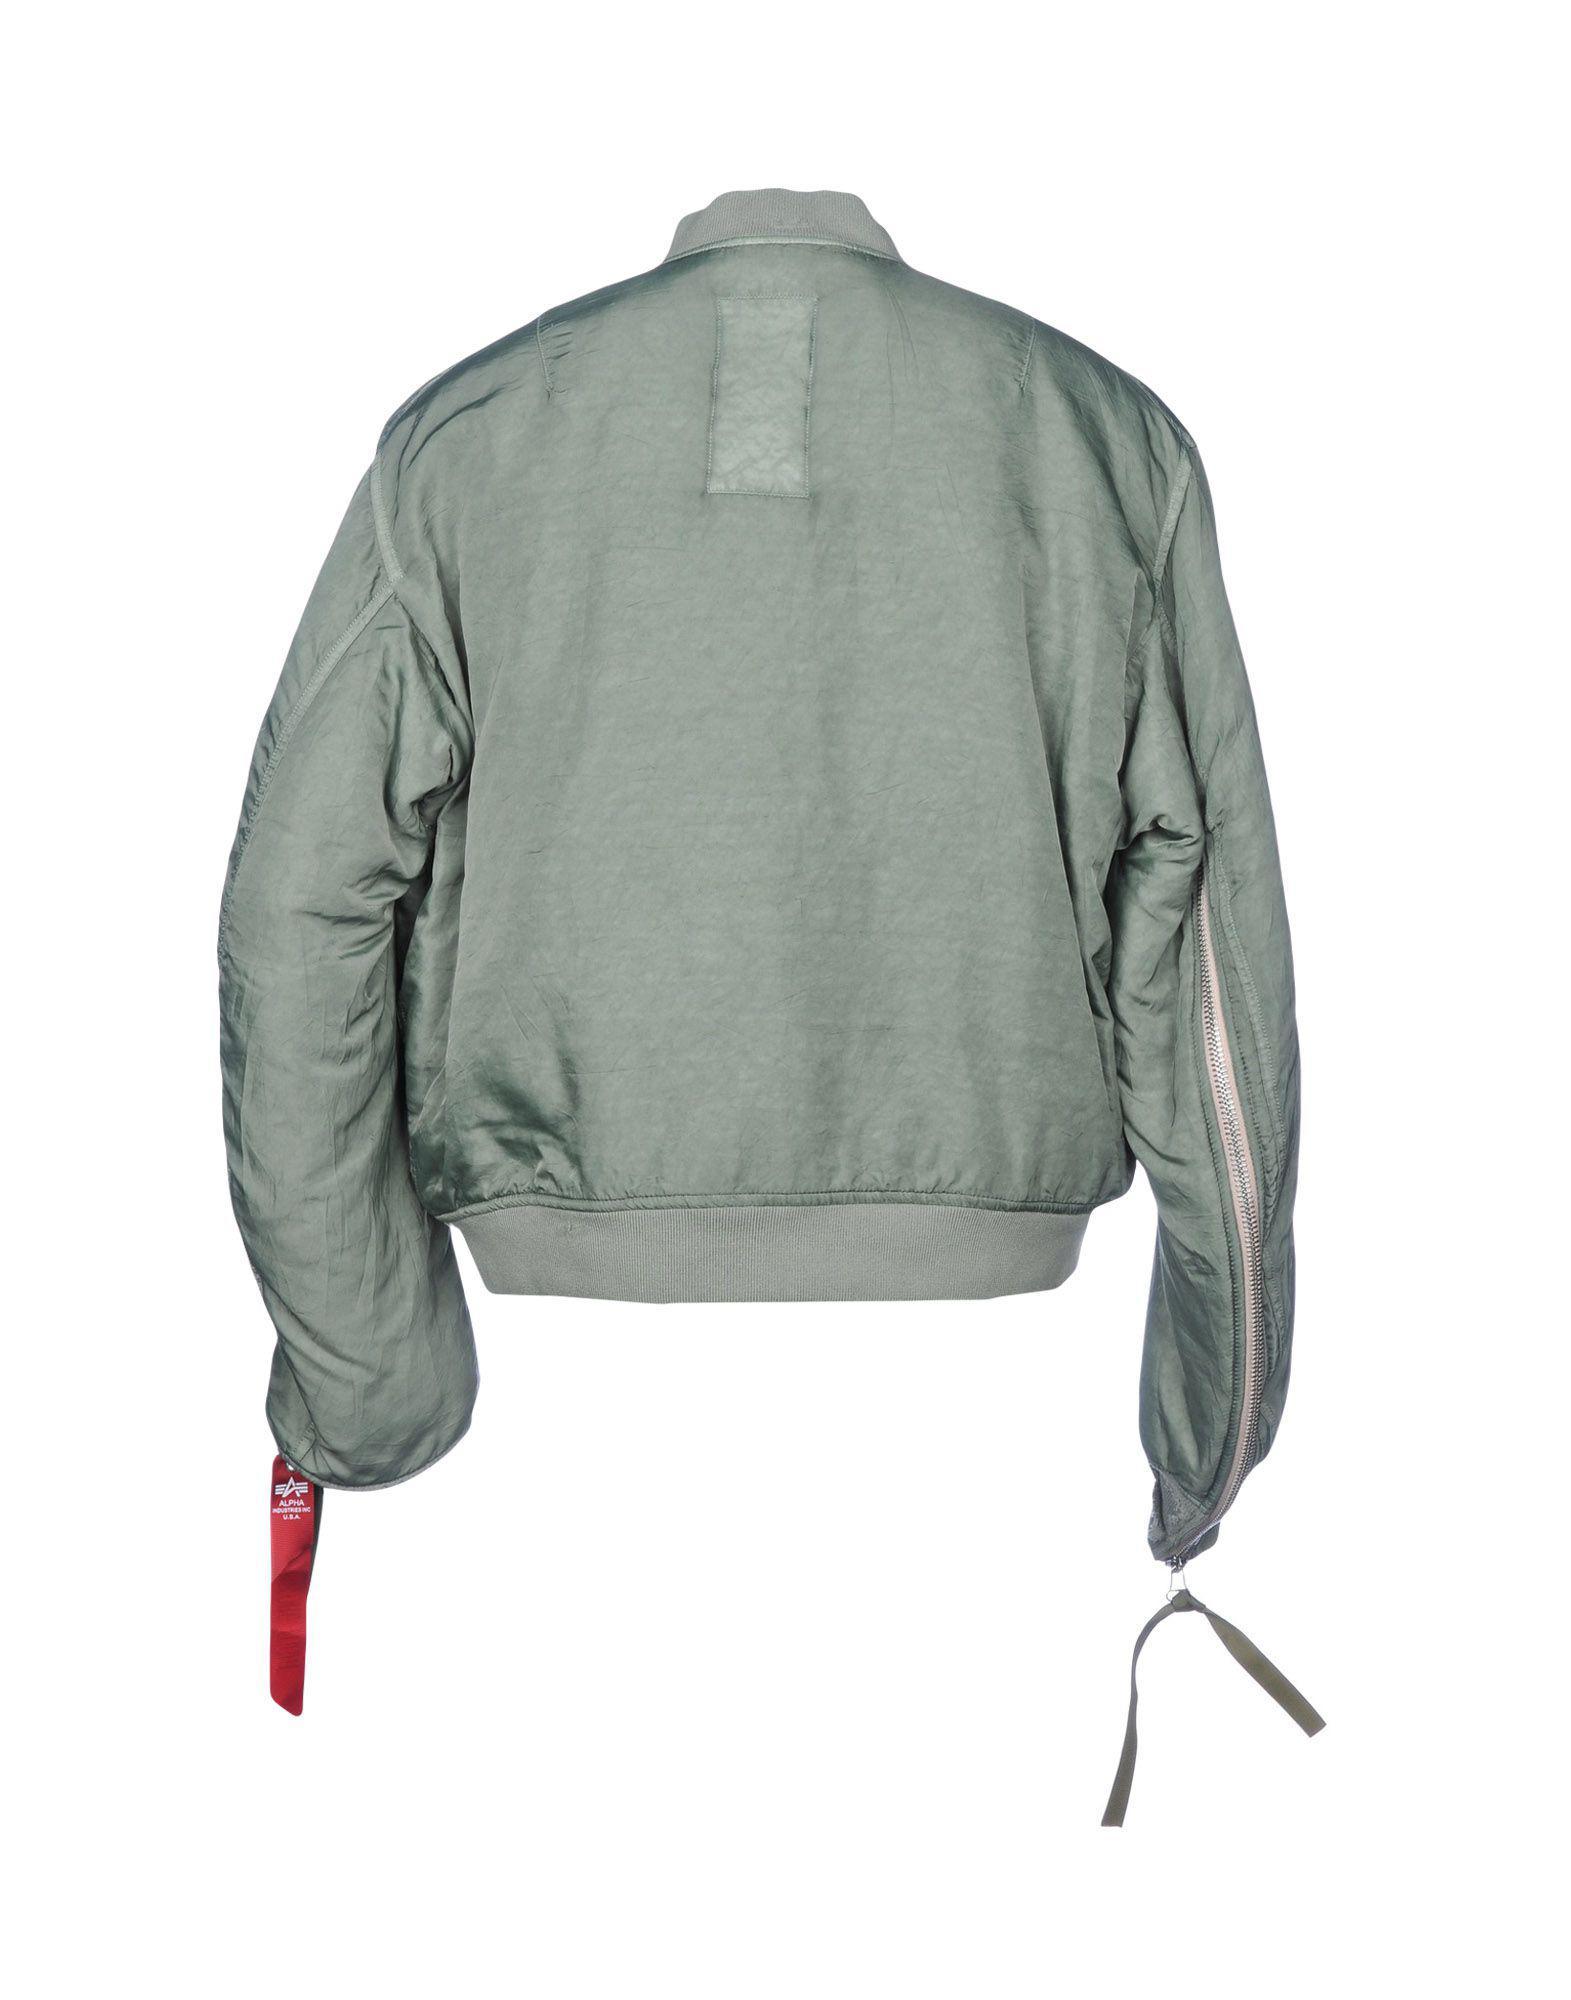 Alpha Industries Synthetic Down Jacket in Deep Jade (Green) for Men